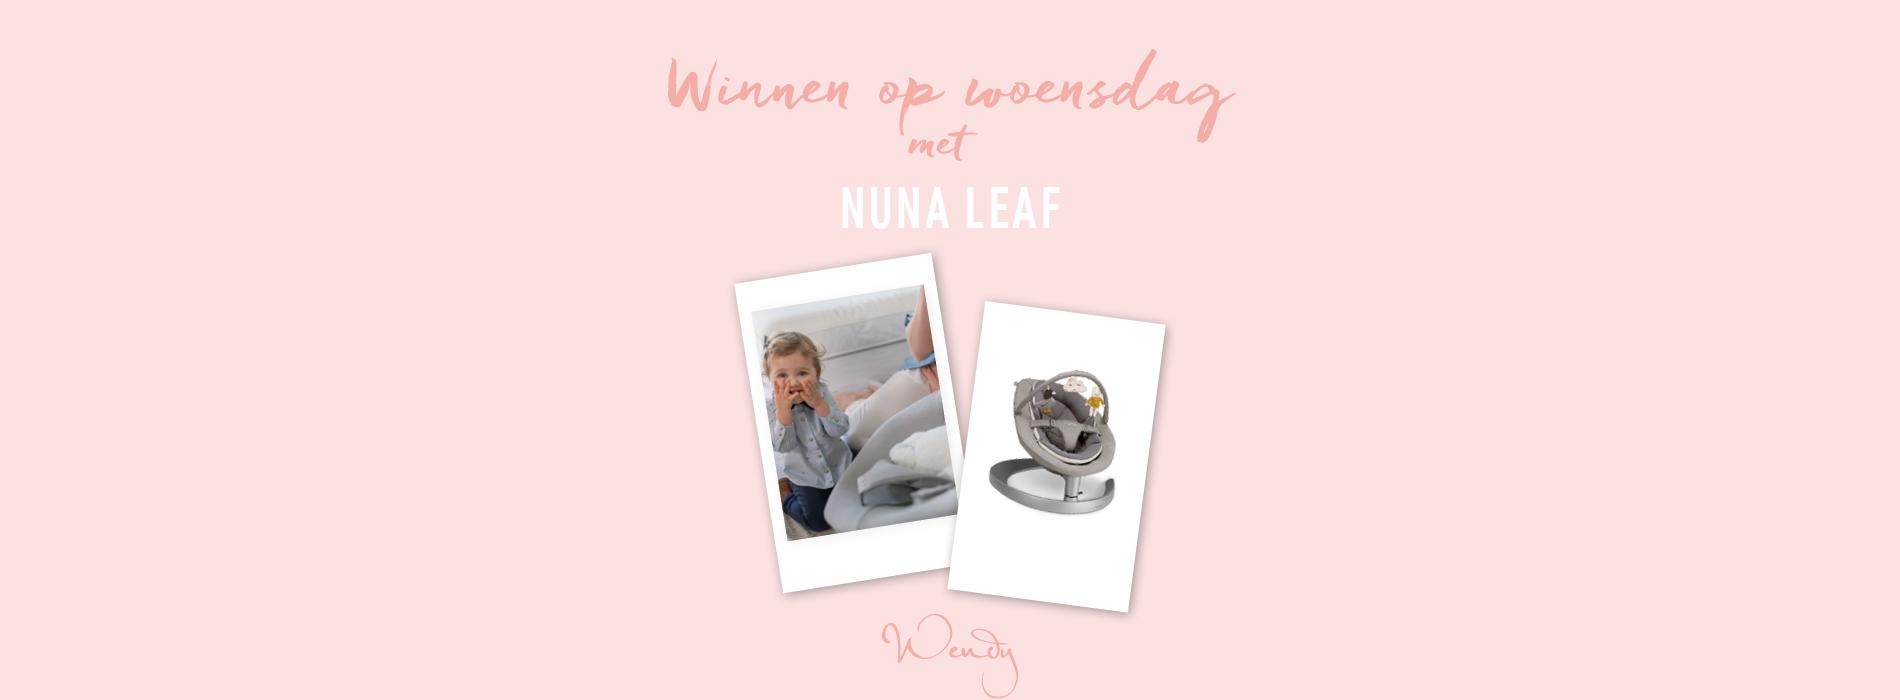 E492461E 0678 4DB8 BCD1 4A8E72A885FA Winnen op woensdag: Nuna Leaf Grow schommelstoel voor baby en kleuter